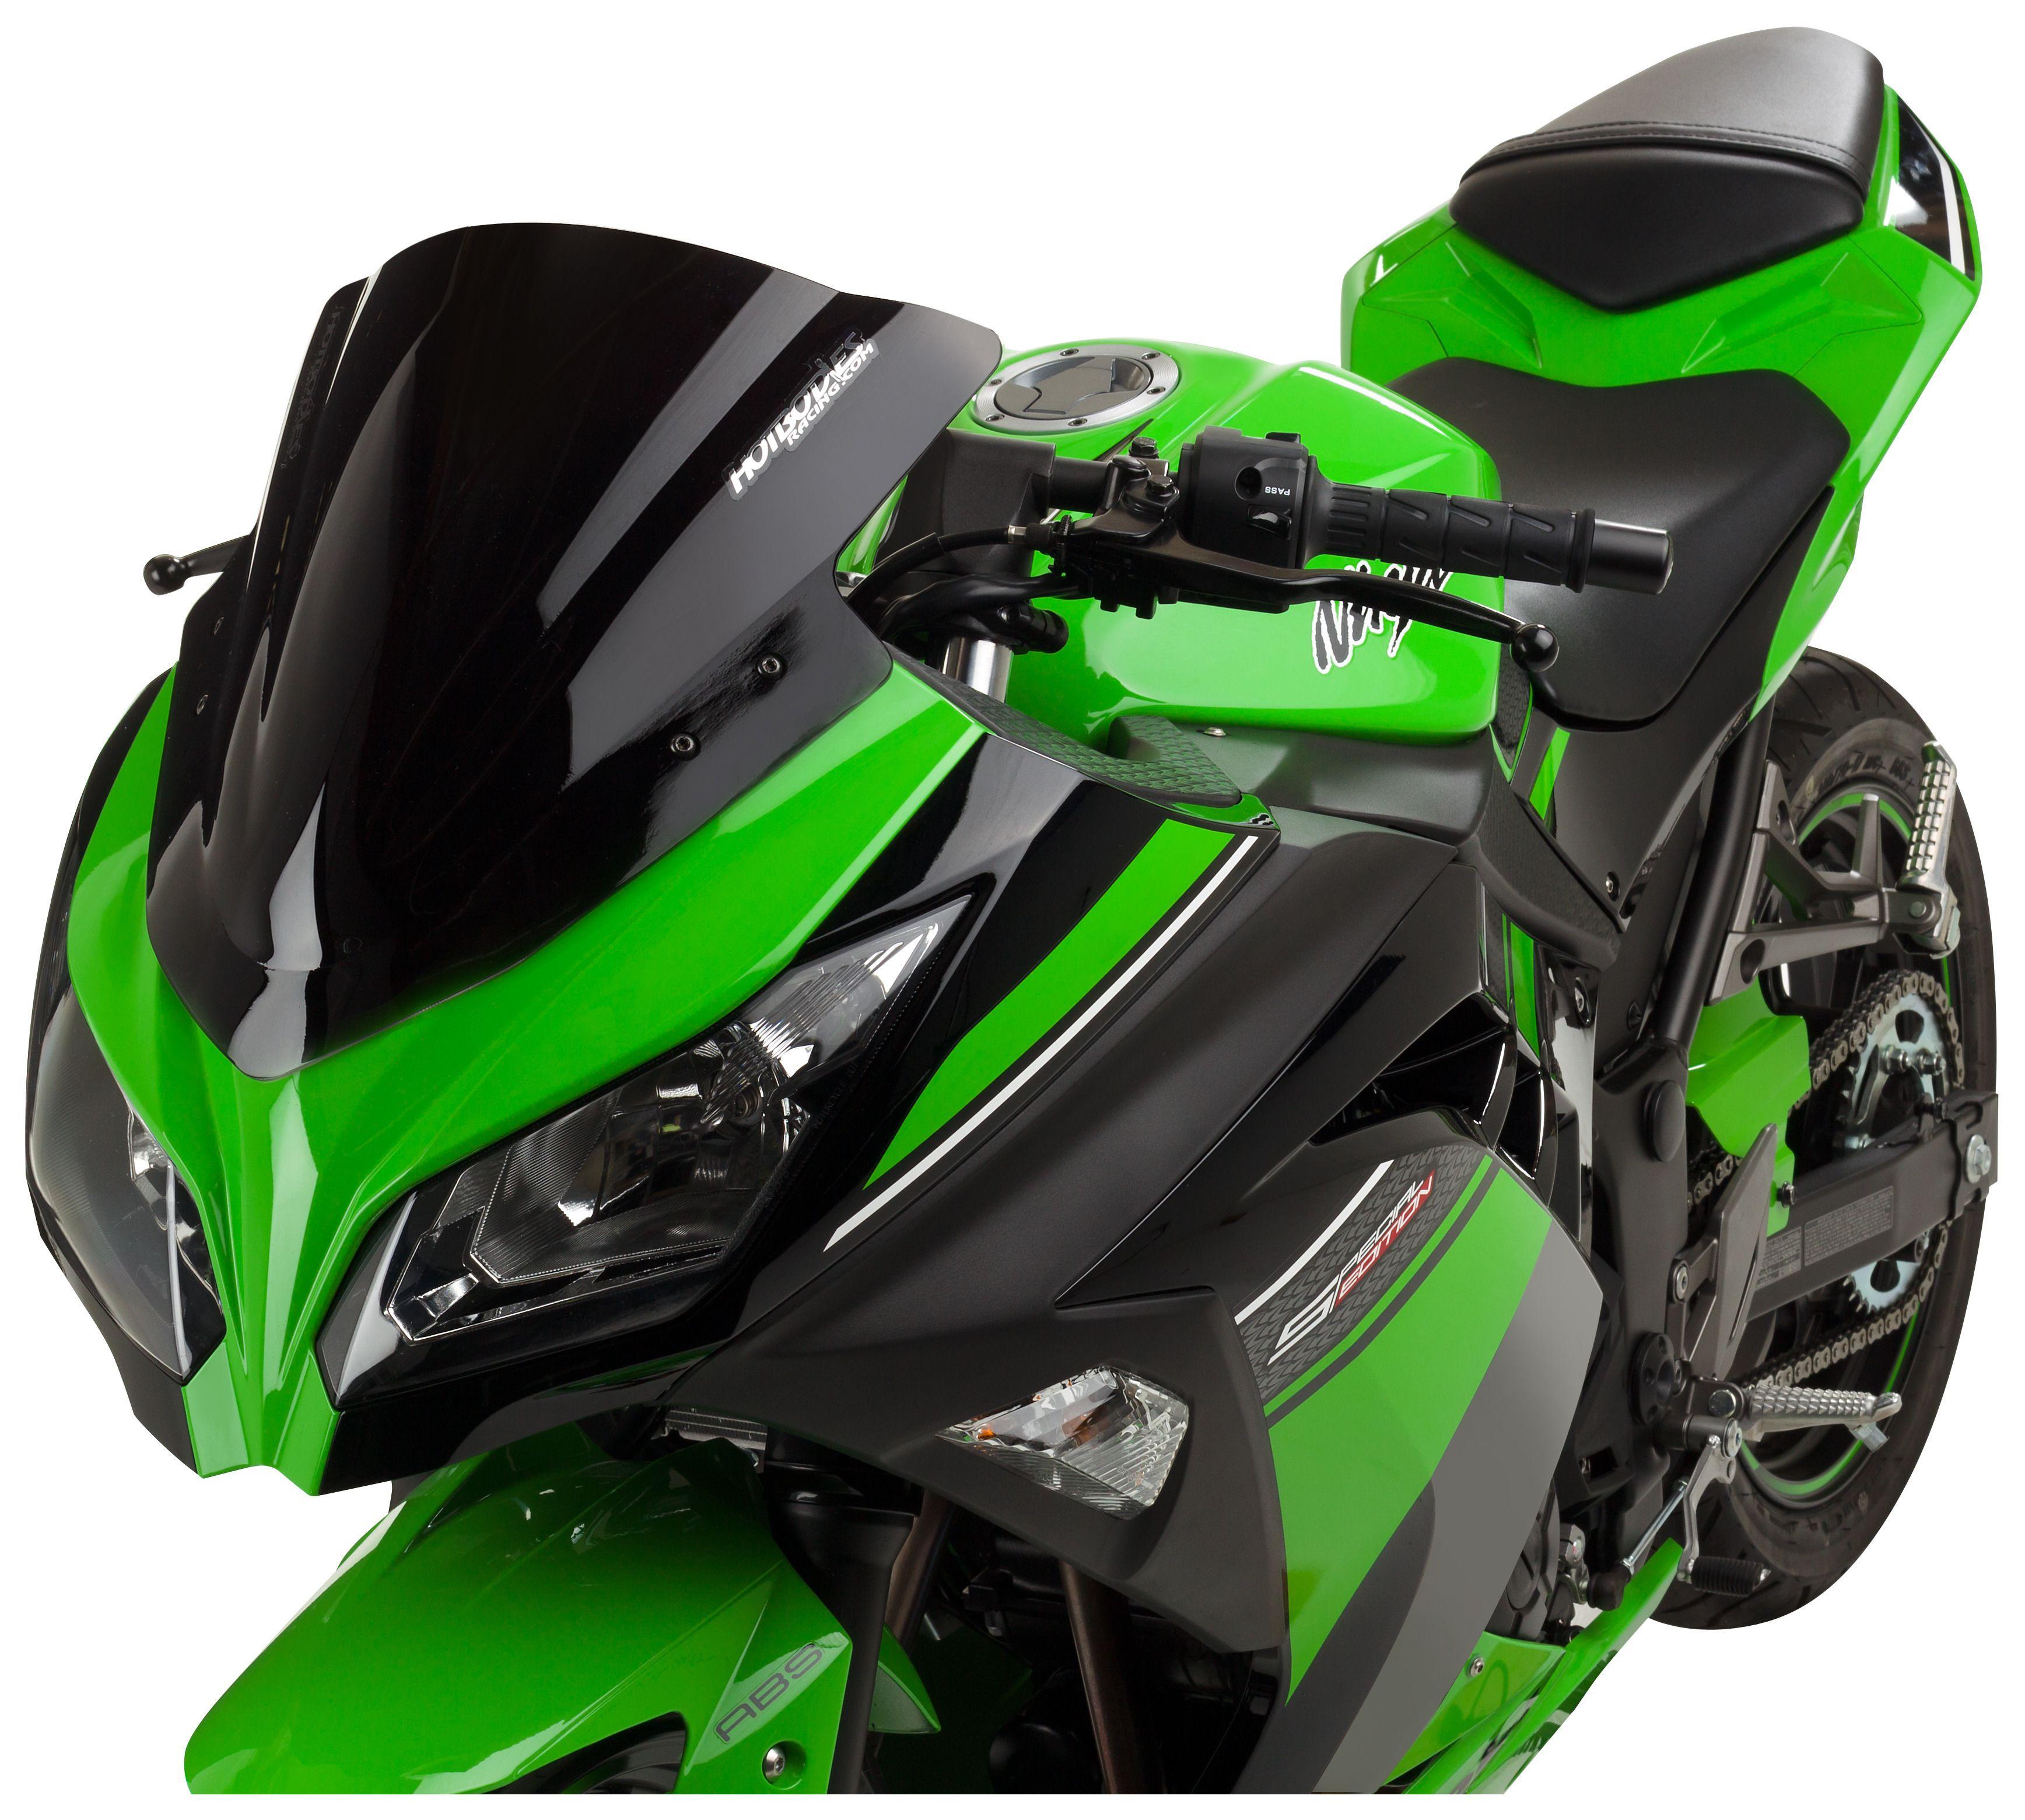 Hotbodies GP Windscreen Kawasaki Ninja 300 2013-2017